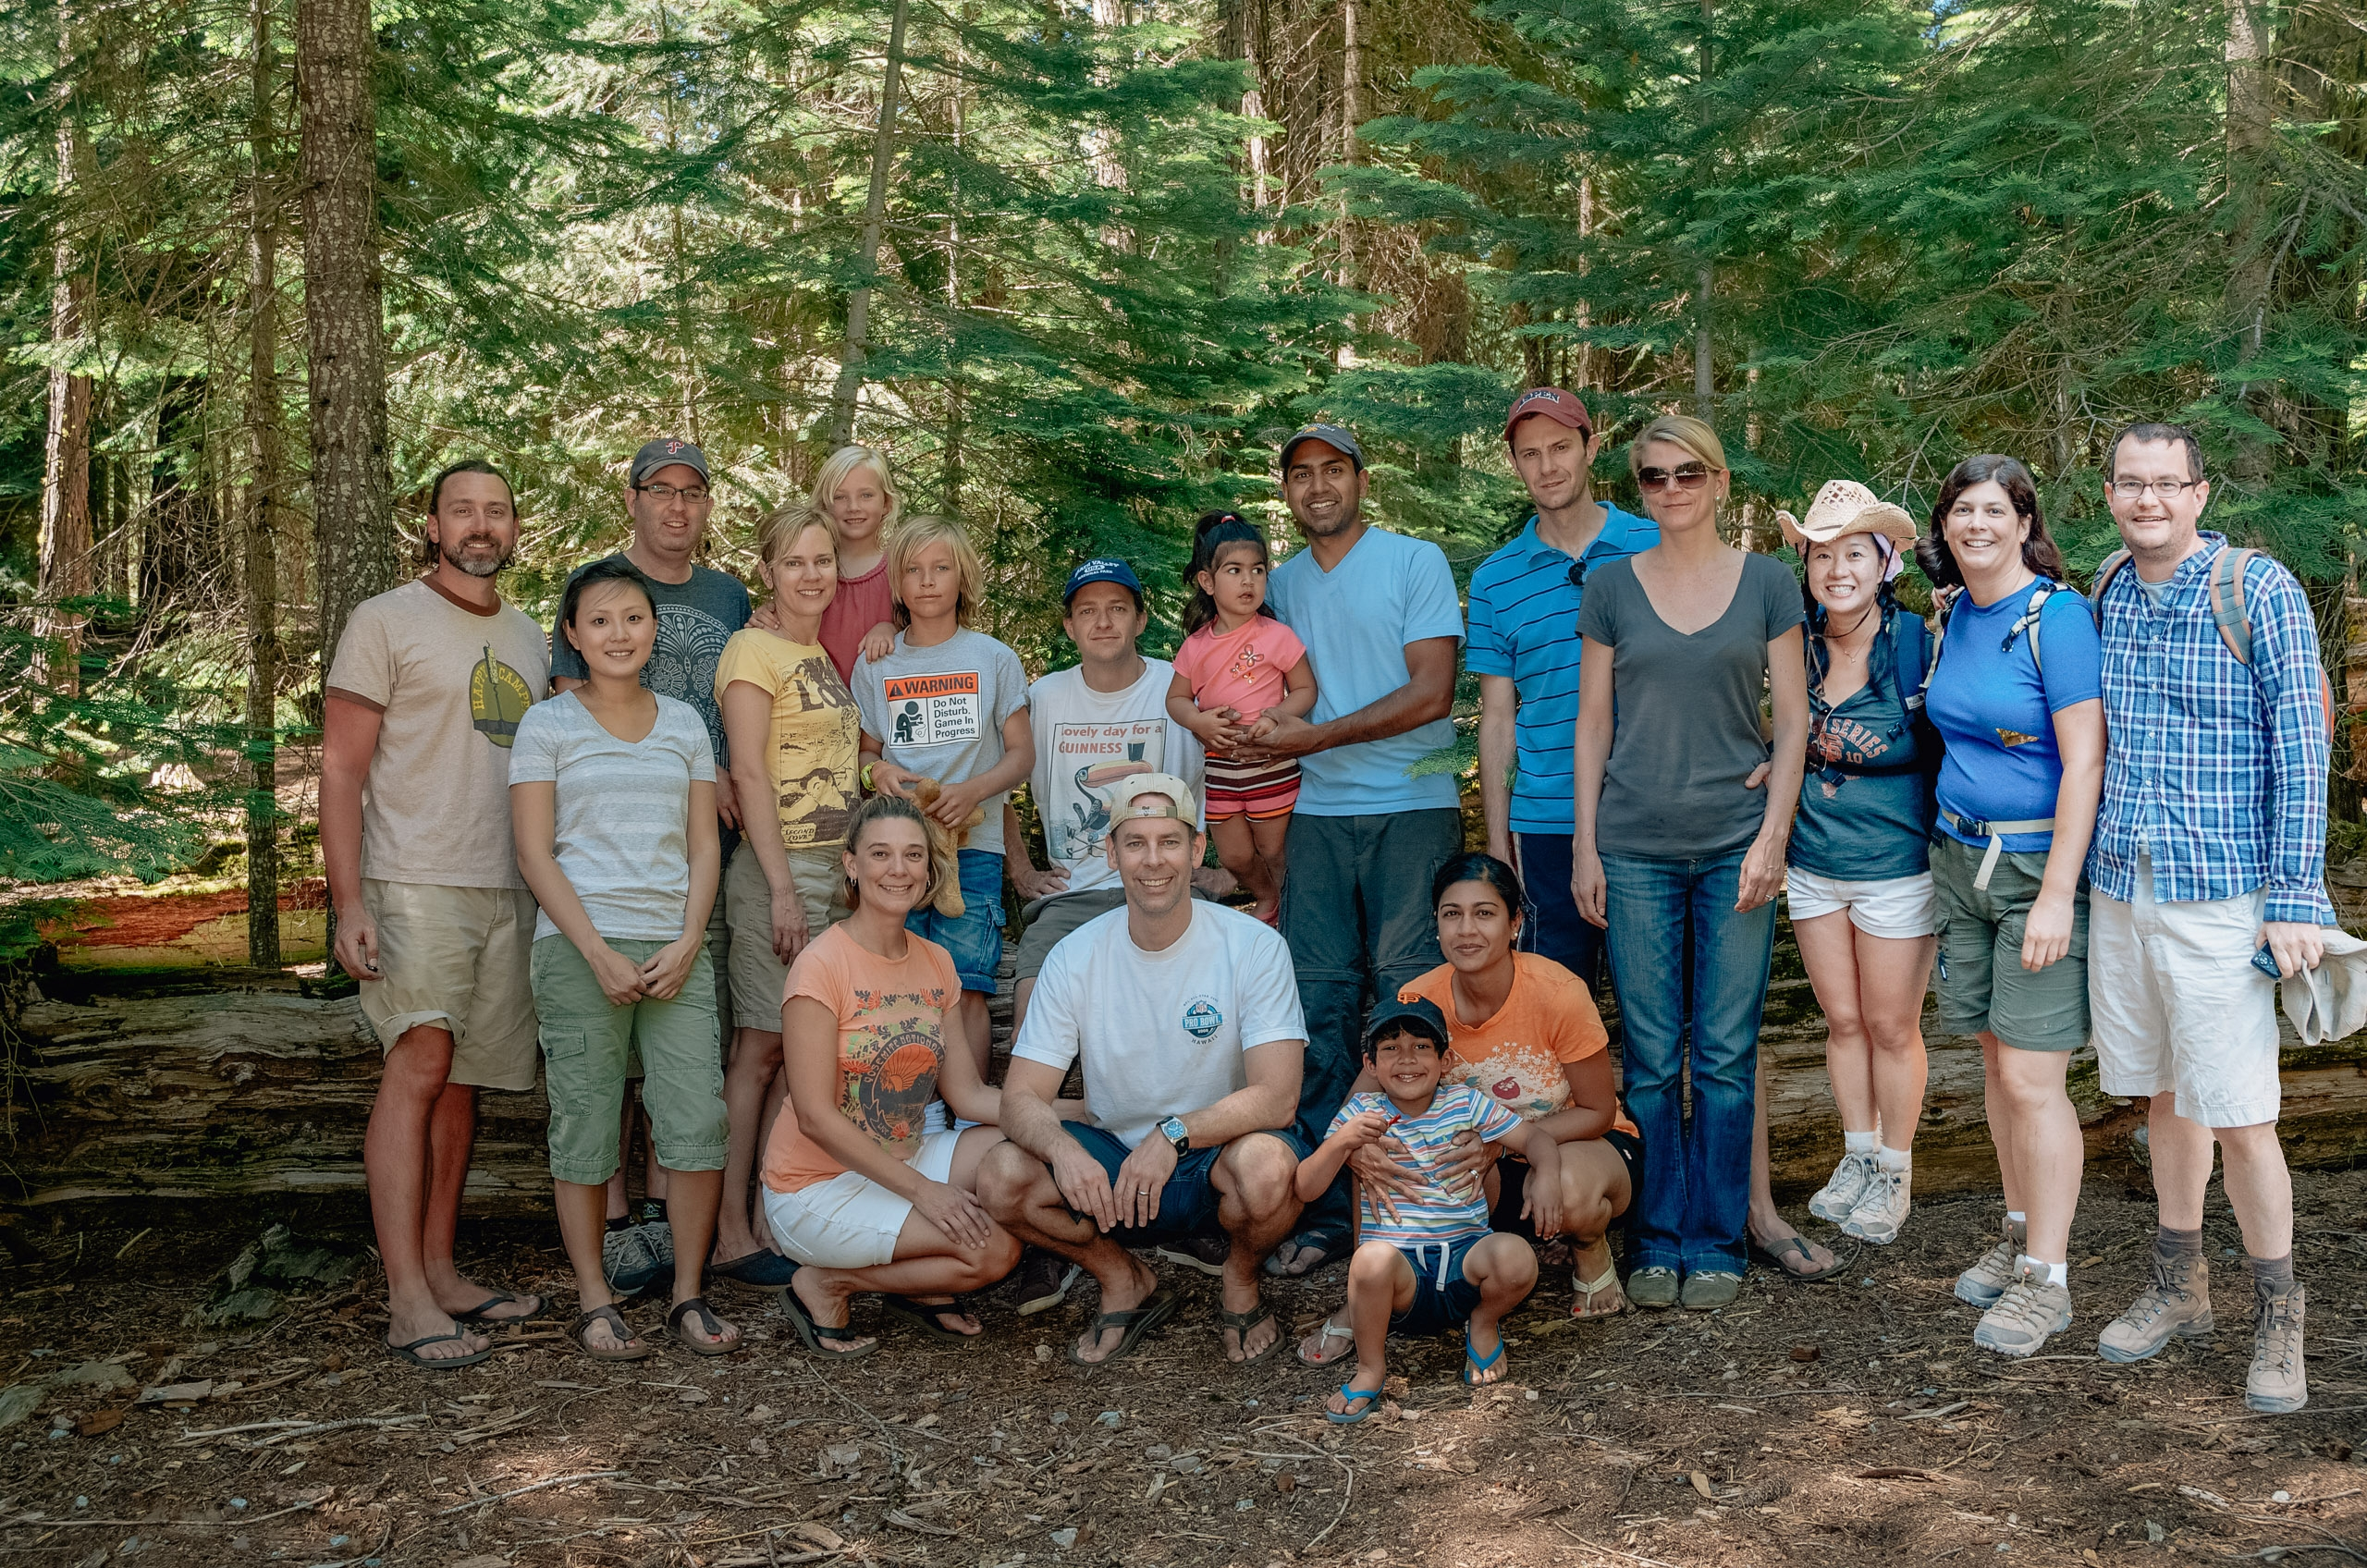 Yosemite National Park - 2011-0710-KPK_8636_63134